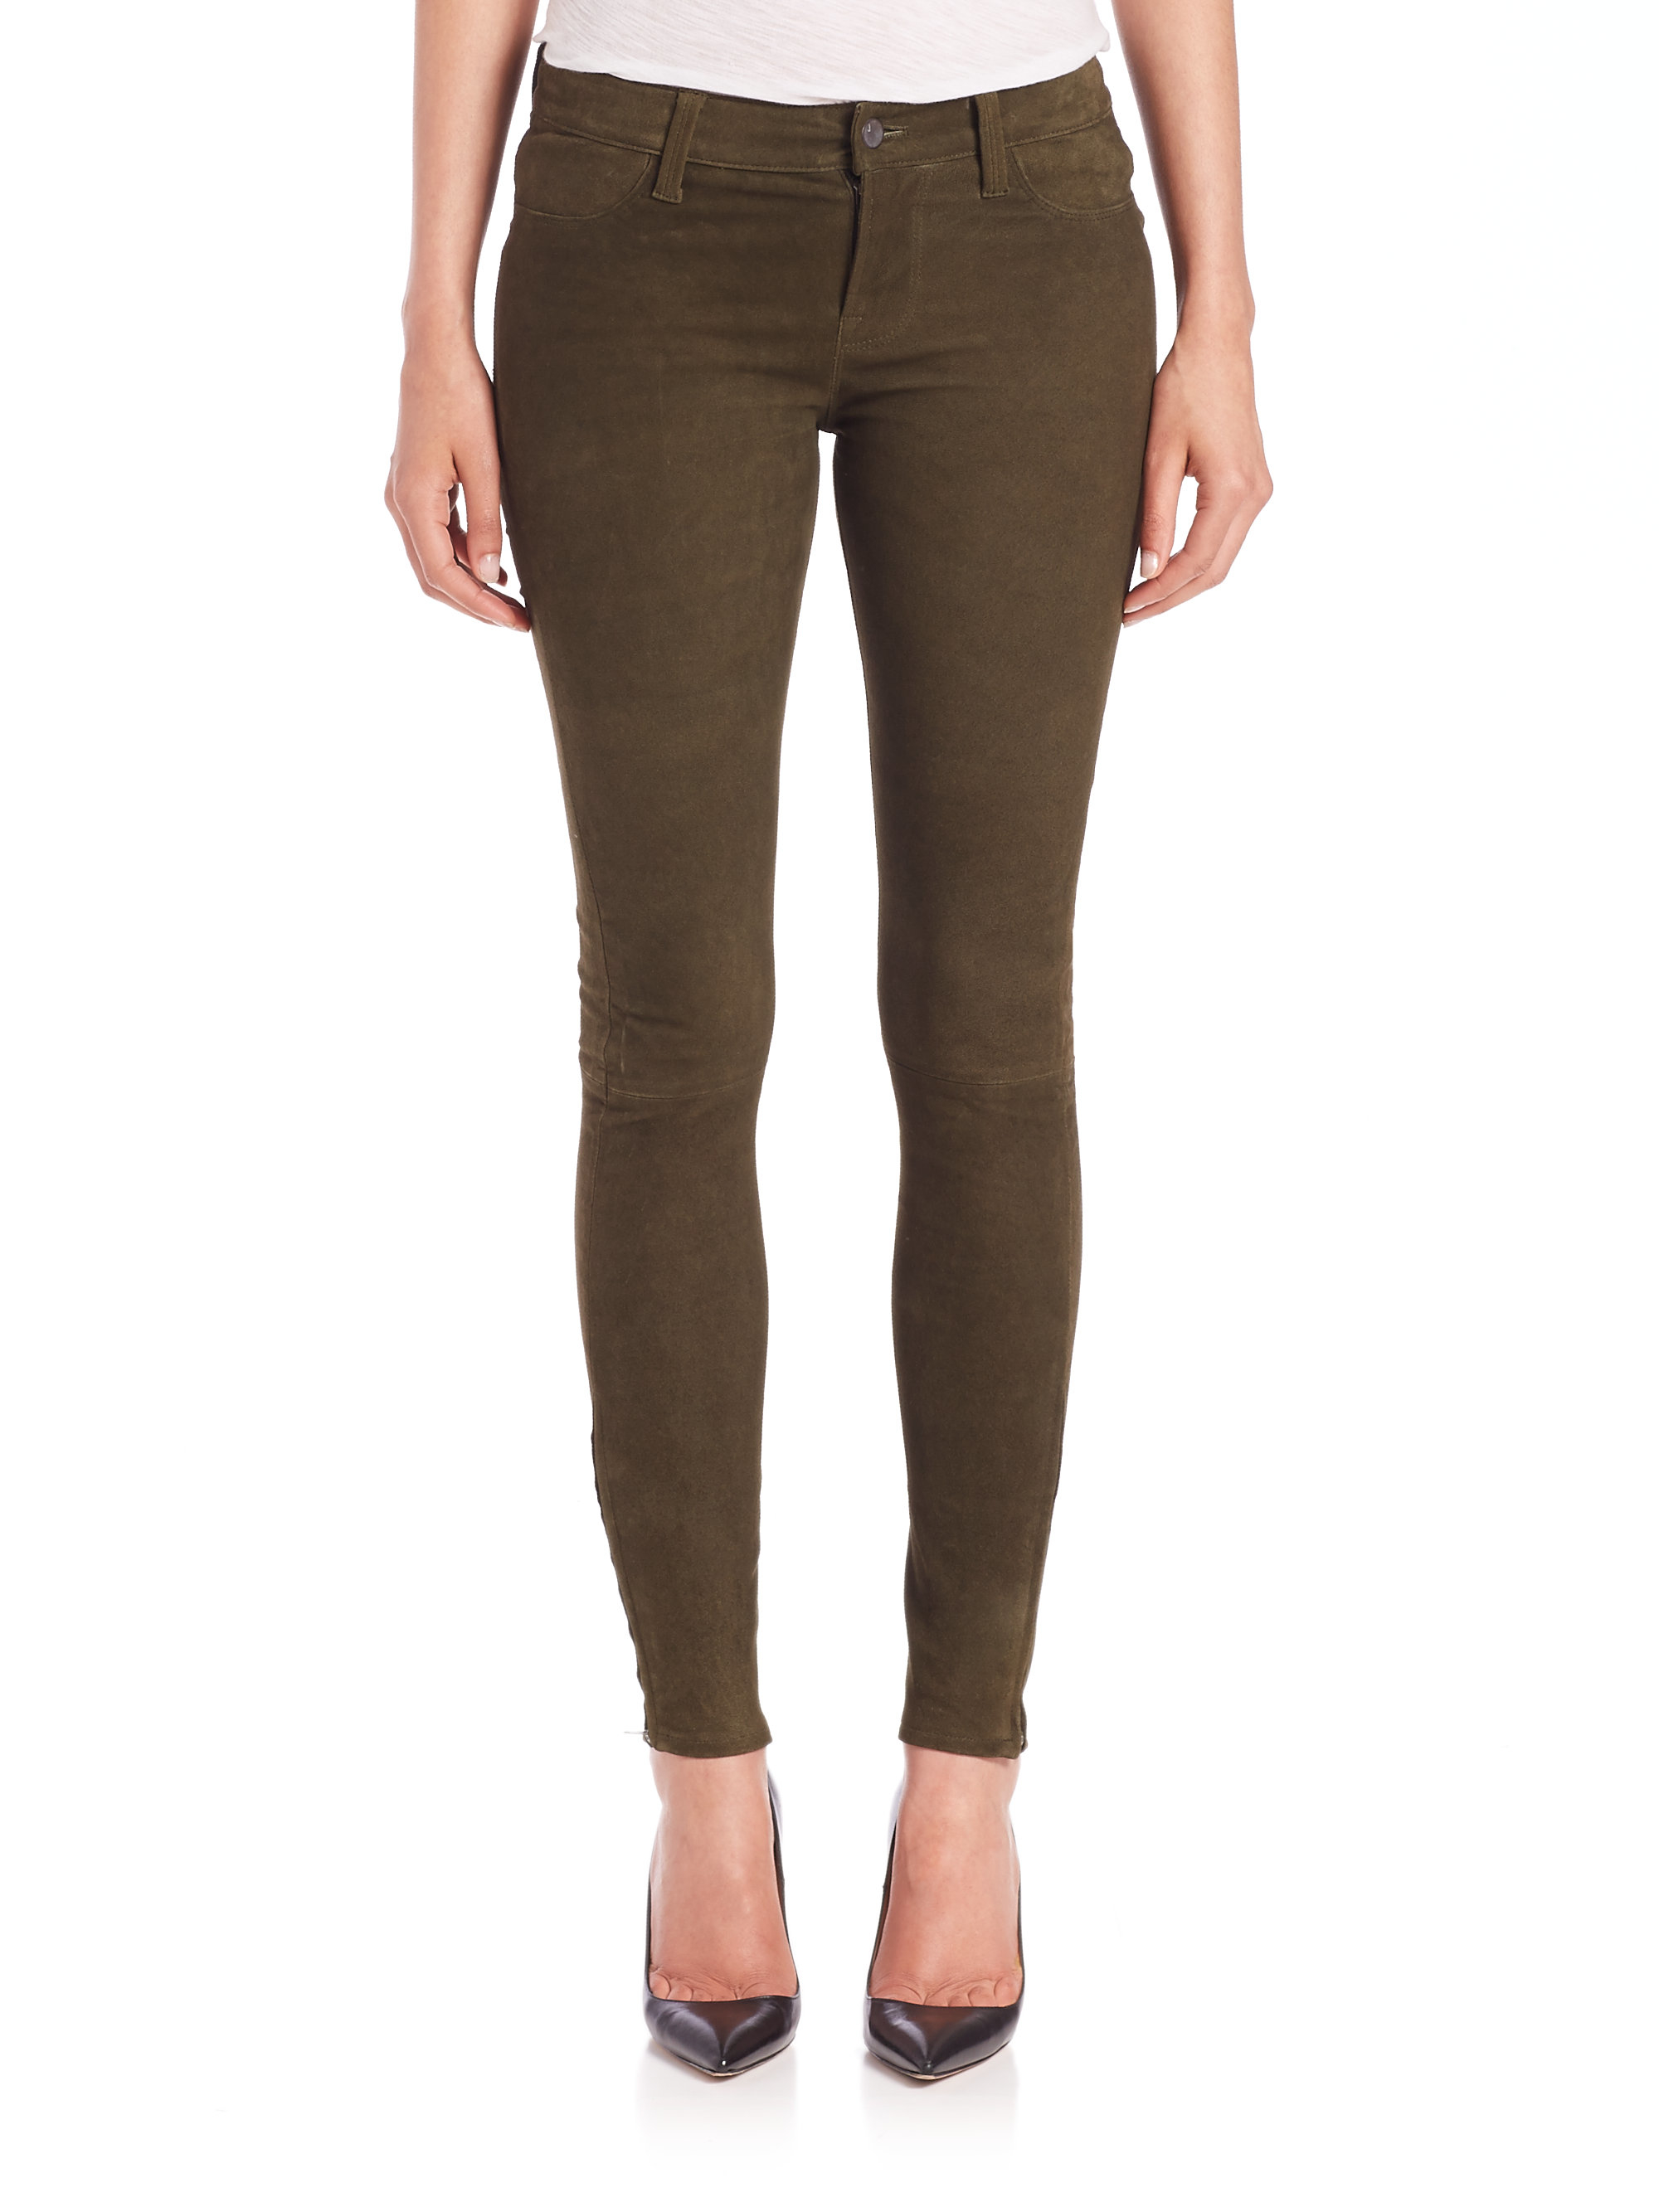 j brand suede skinny jeans in green lyst. Black Bedroom Furniture Sets. Home Design Ideas